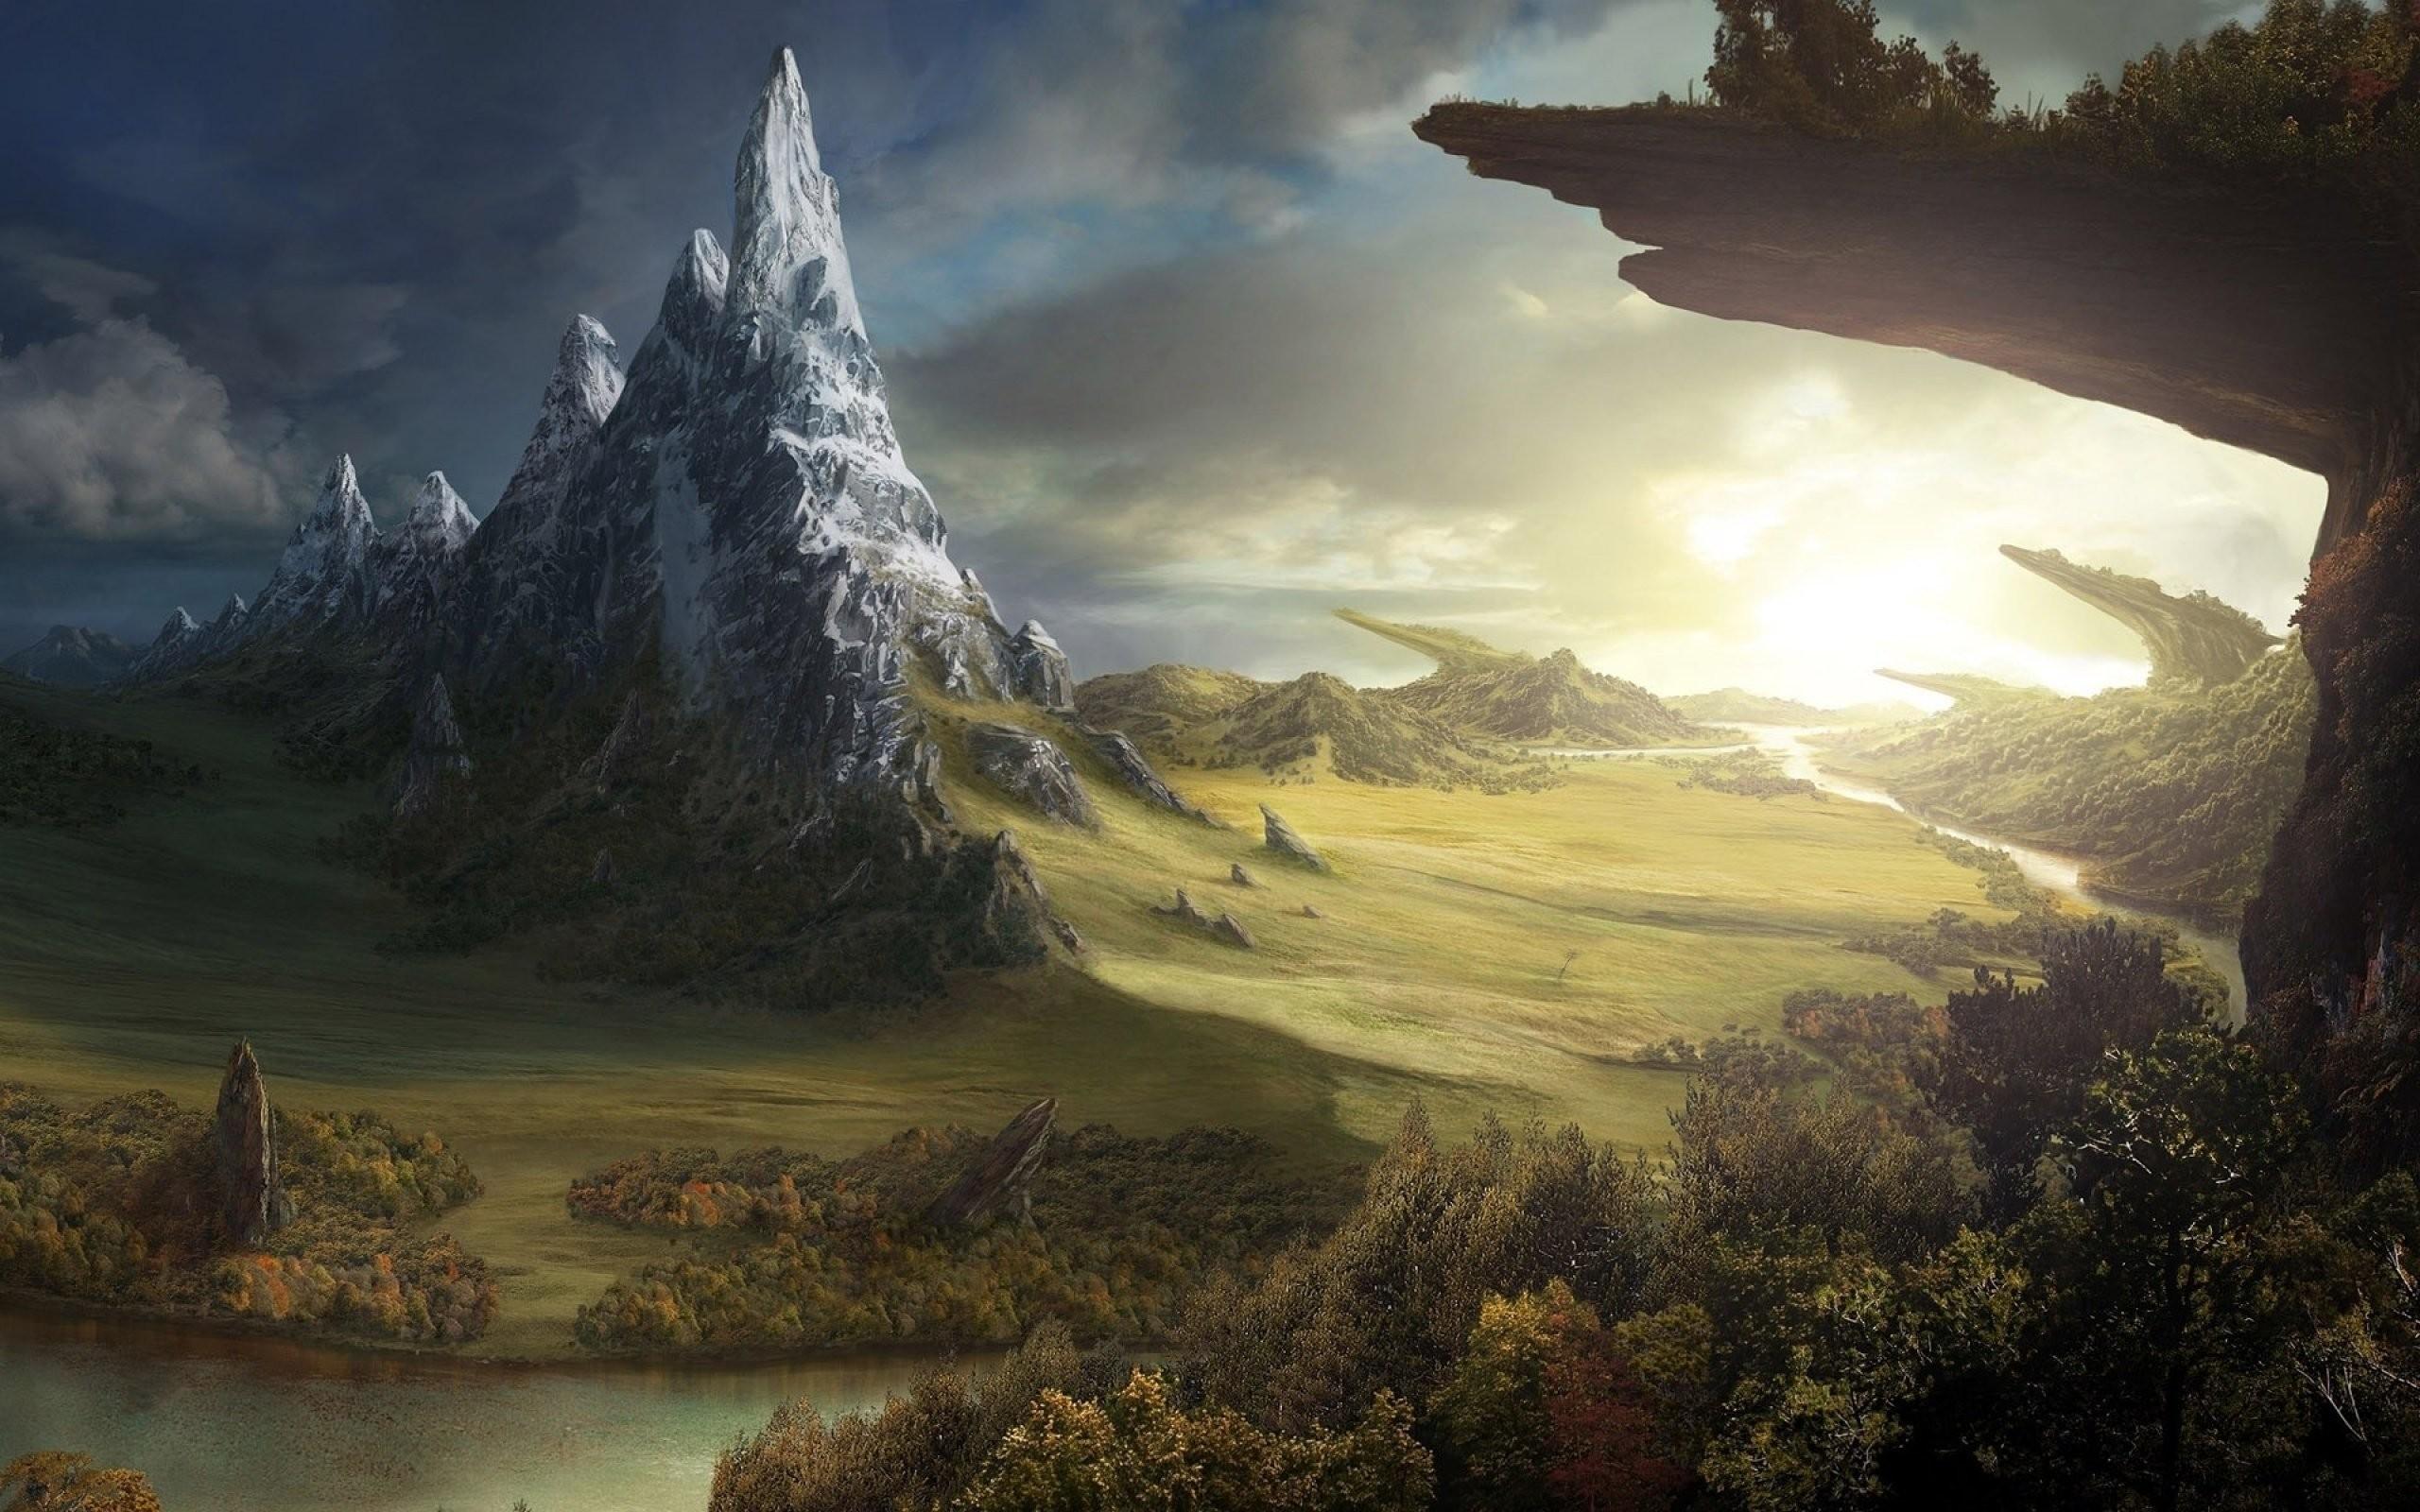 Fantasy Wallpapers Landscape Art Artwork Nature   Data - Fantasy World Background - HD Wallpaper